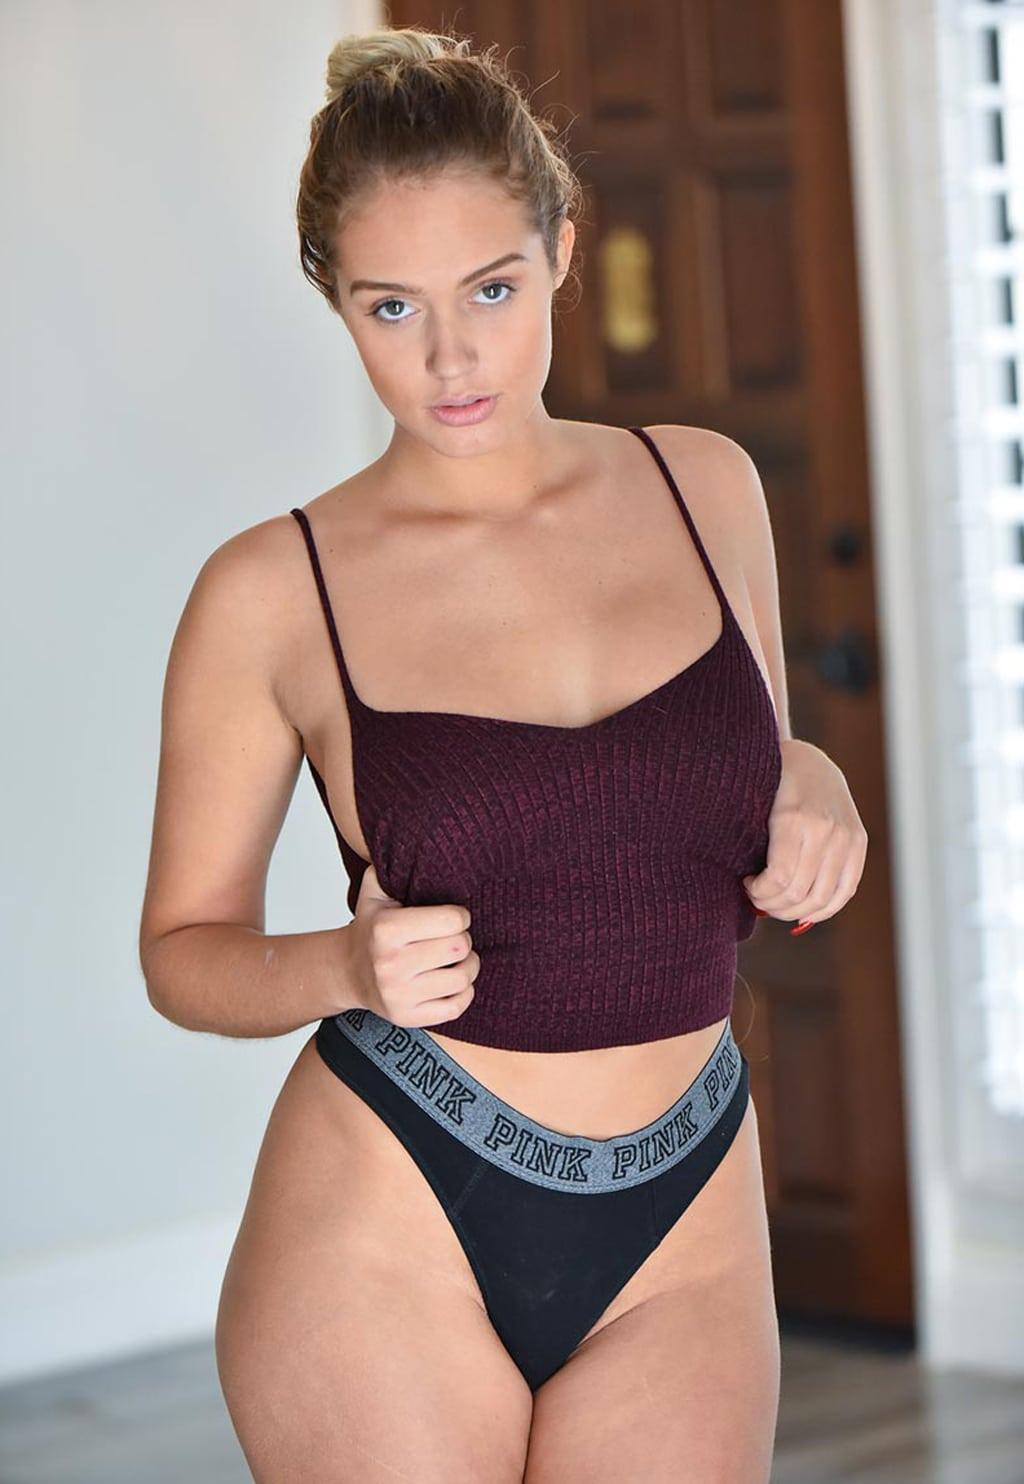 Paparazzi Athena Palomino nude (98 photos), Topless, Sideboobs, Feet, in bikini 2018